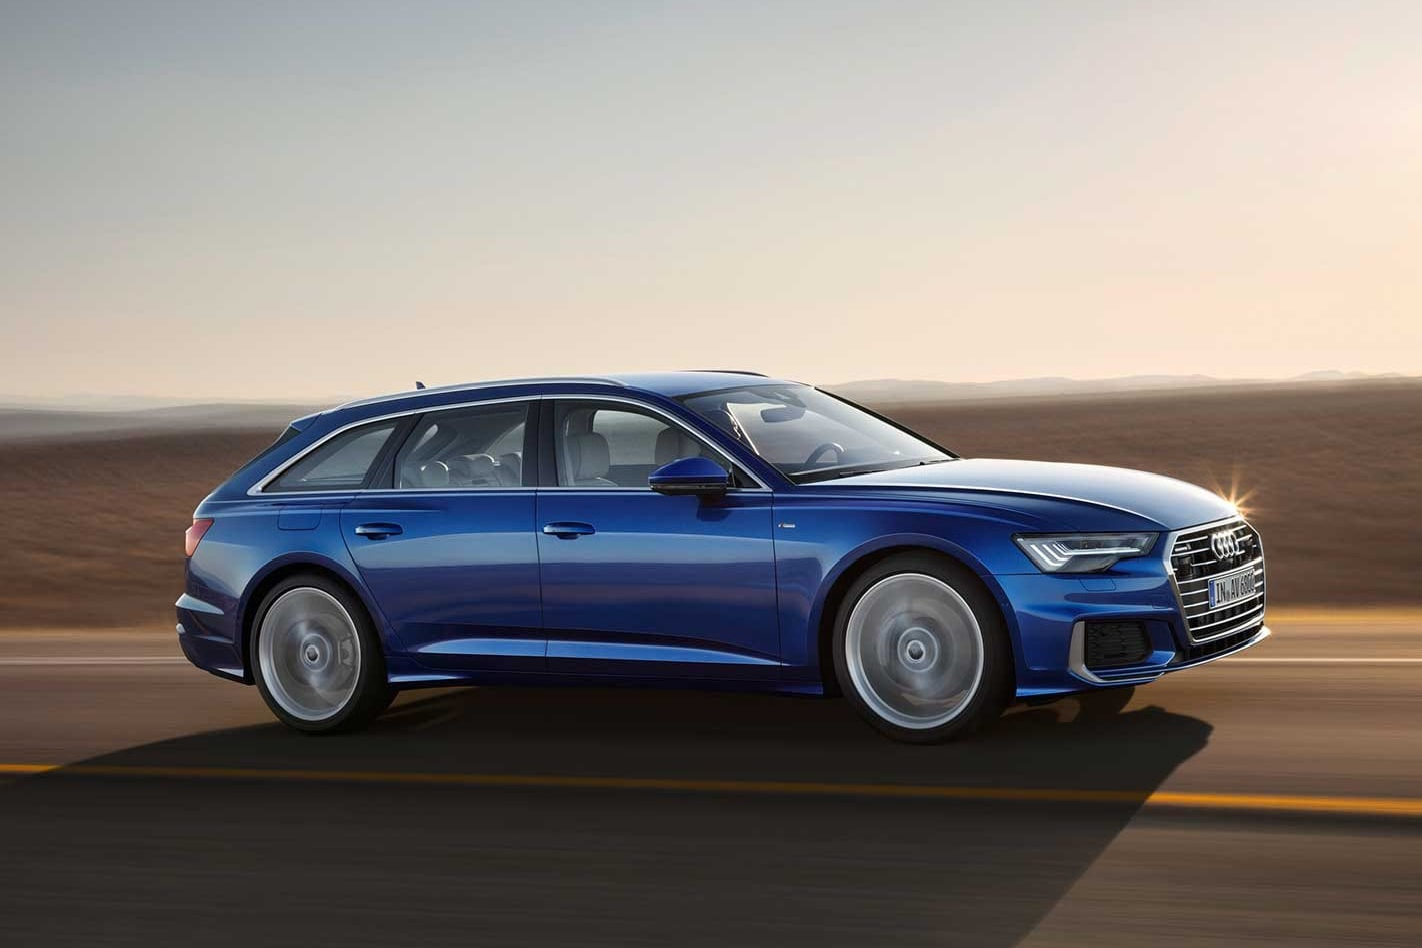 2018 Audi A6 Avant revealed